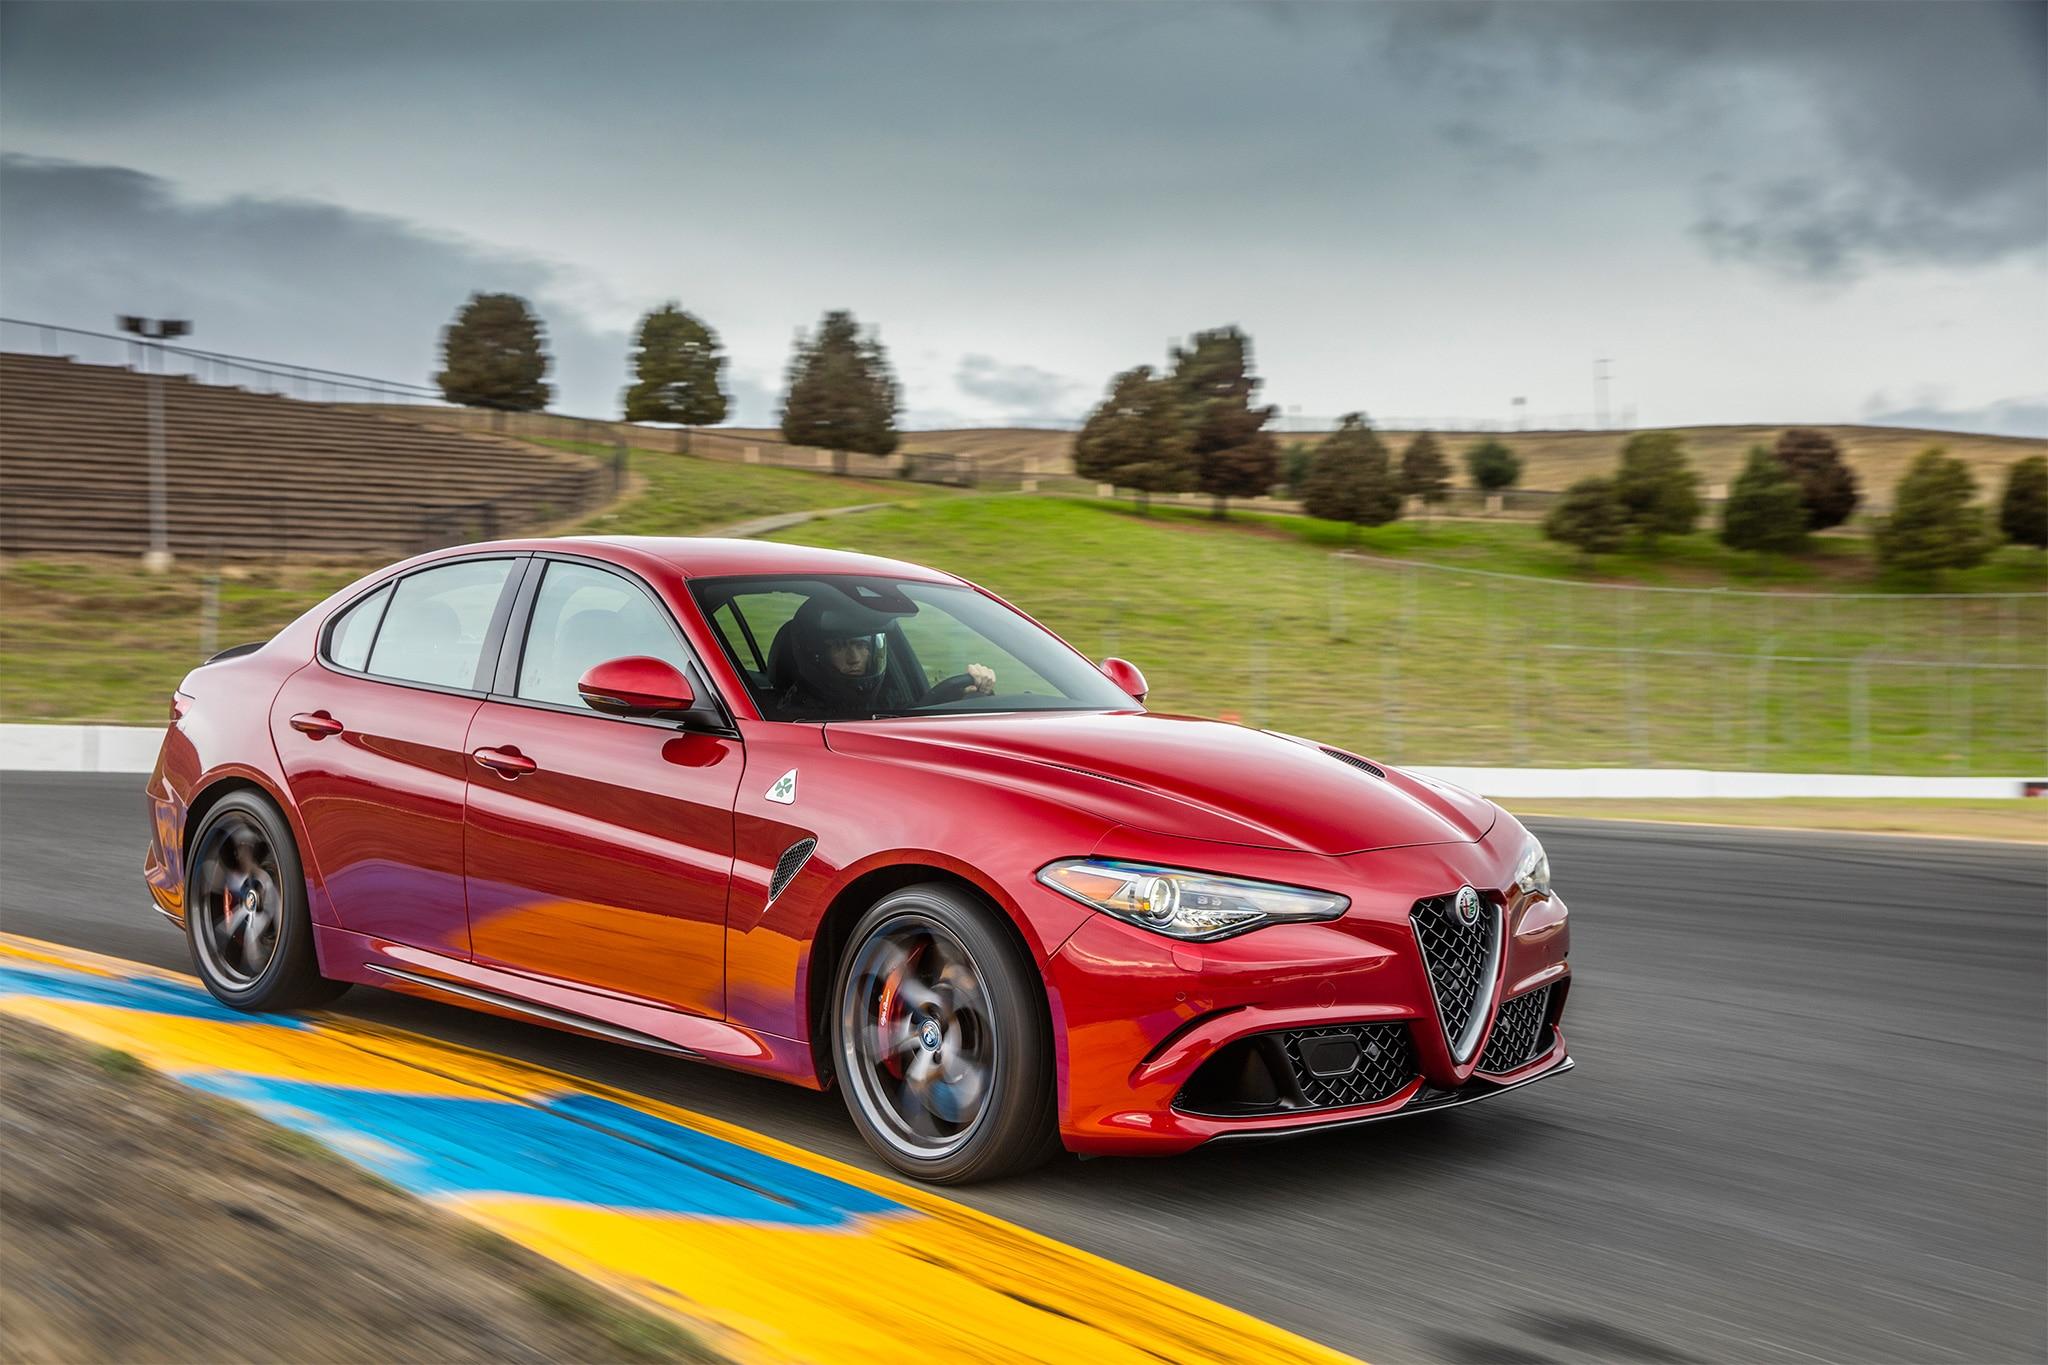 2017 Alfa Romeo Giulia >> 2017 Alfa Romeo Giulia Quadrifoglio One Week Review   Automobile Magazine